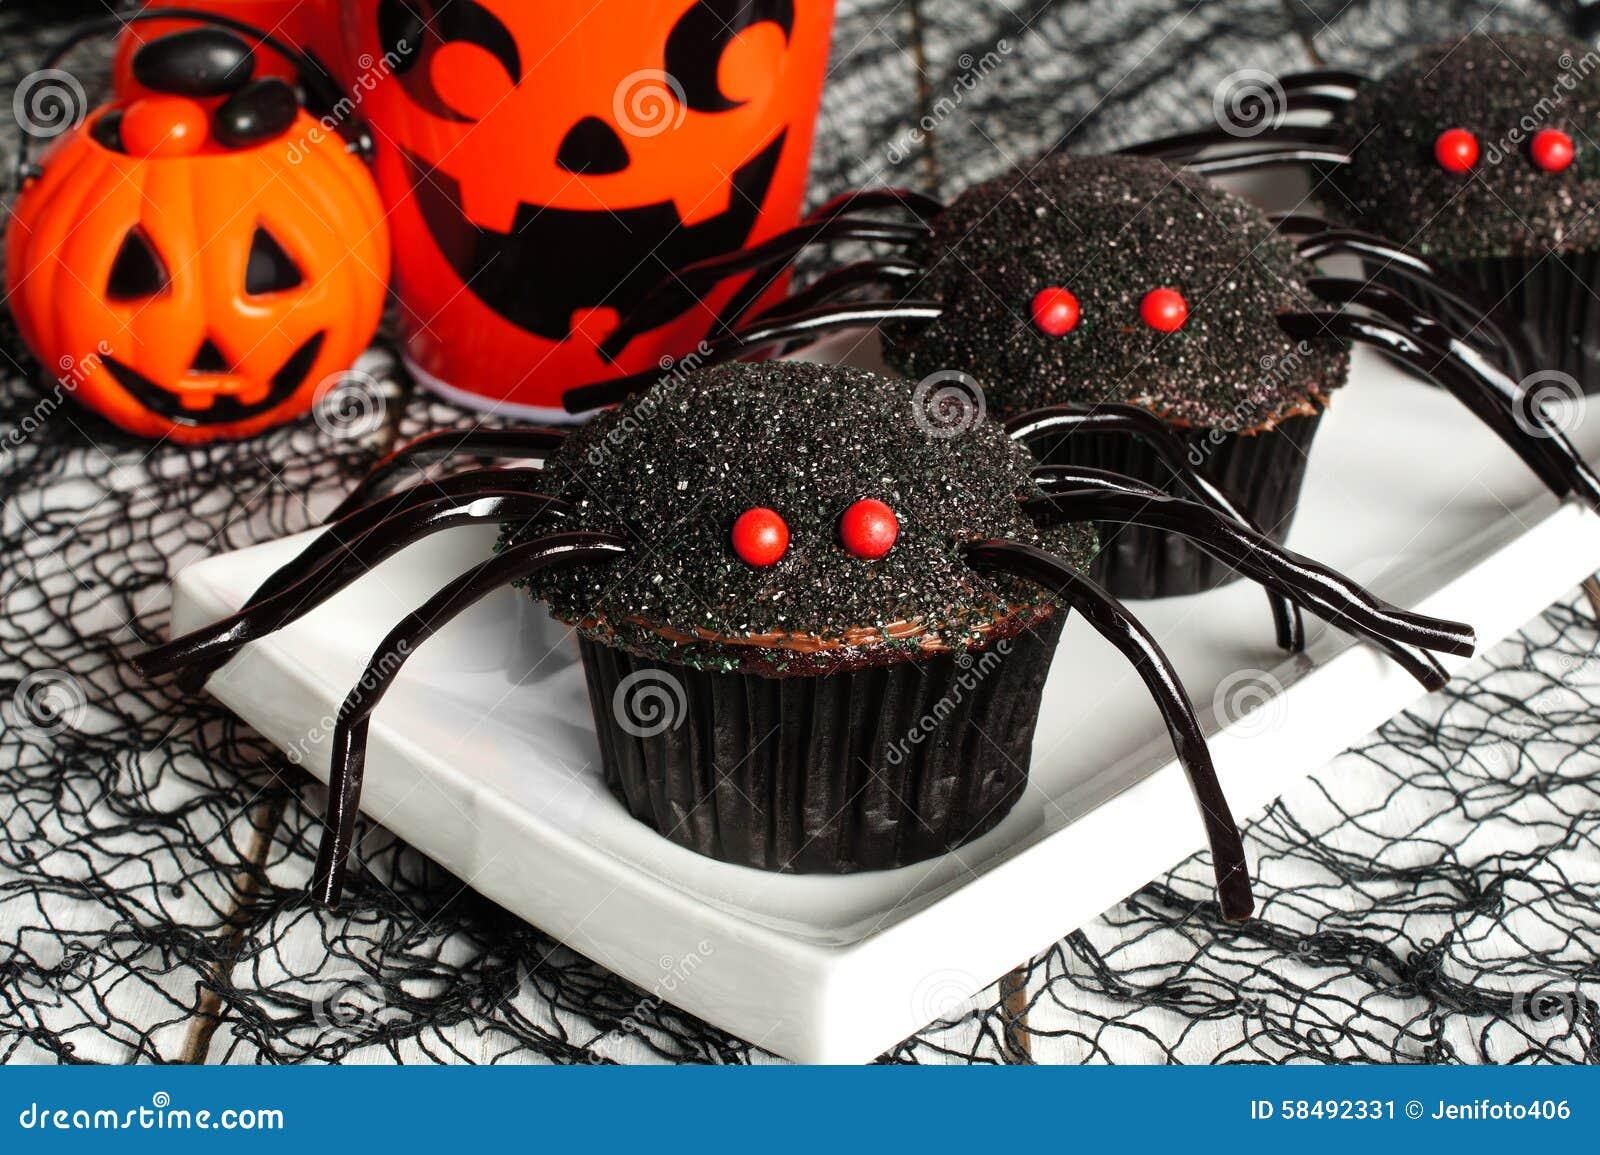 Halloween Spider Cupcakes With Decor Stock Photo - Image: 58492331